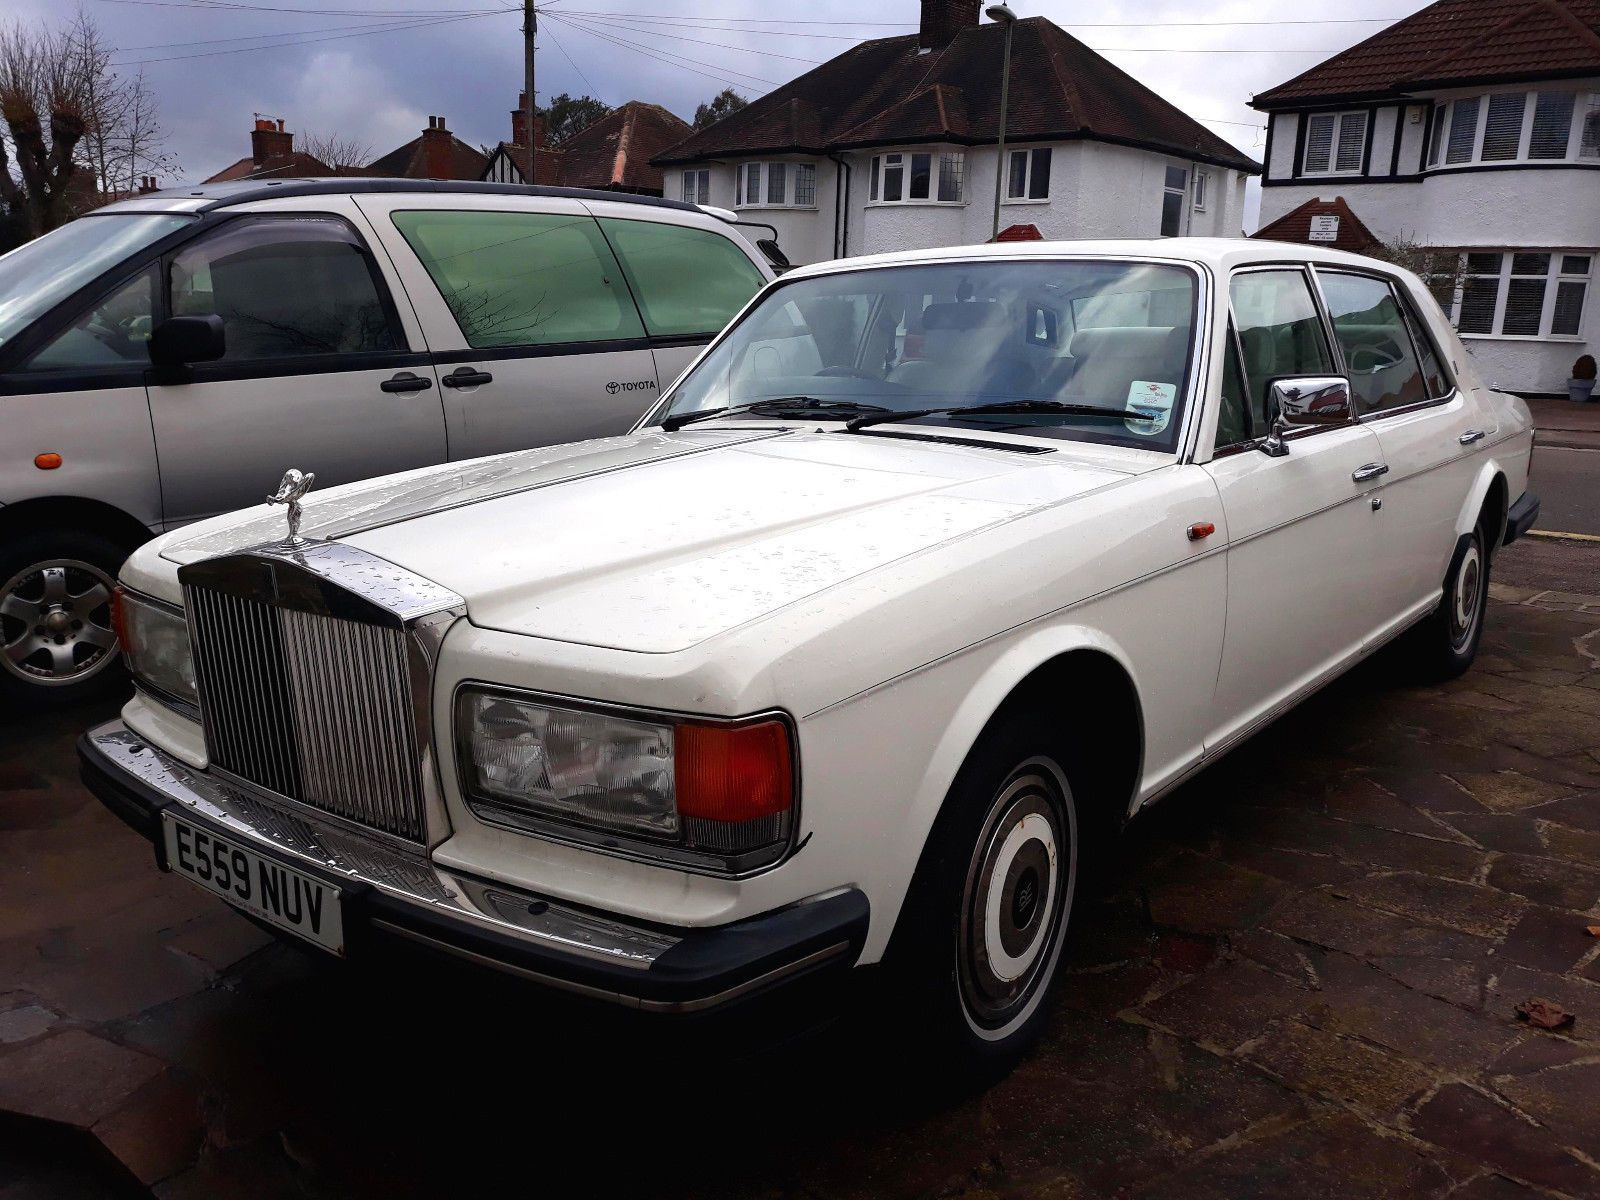 Rolls Royce Silver Spur LWB Cars Pinterest